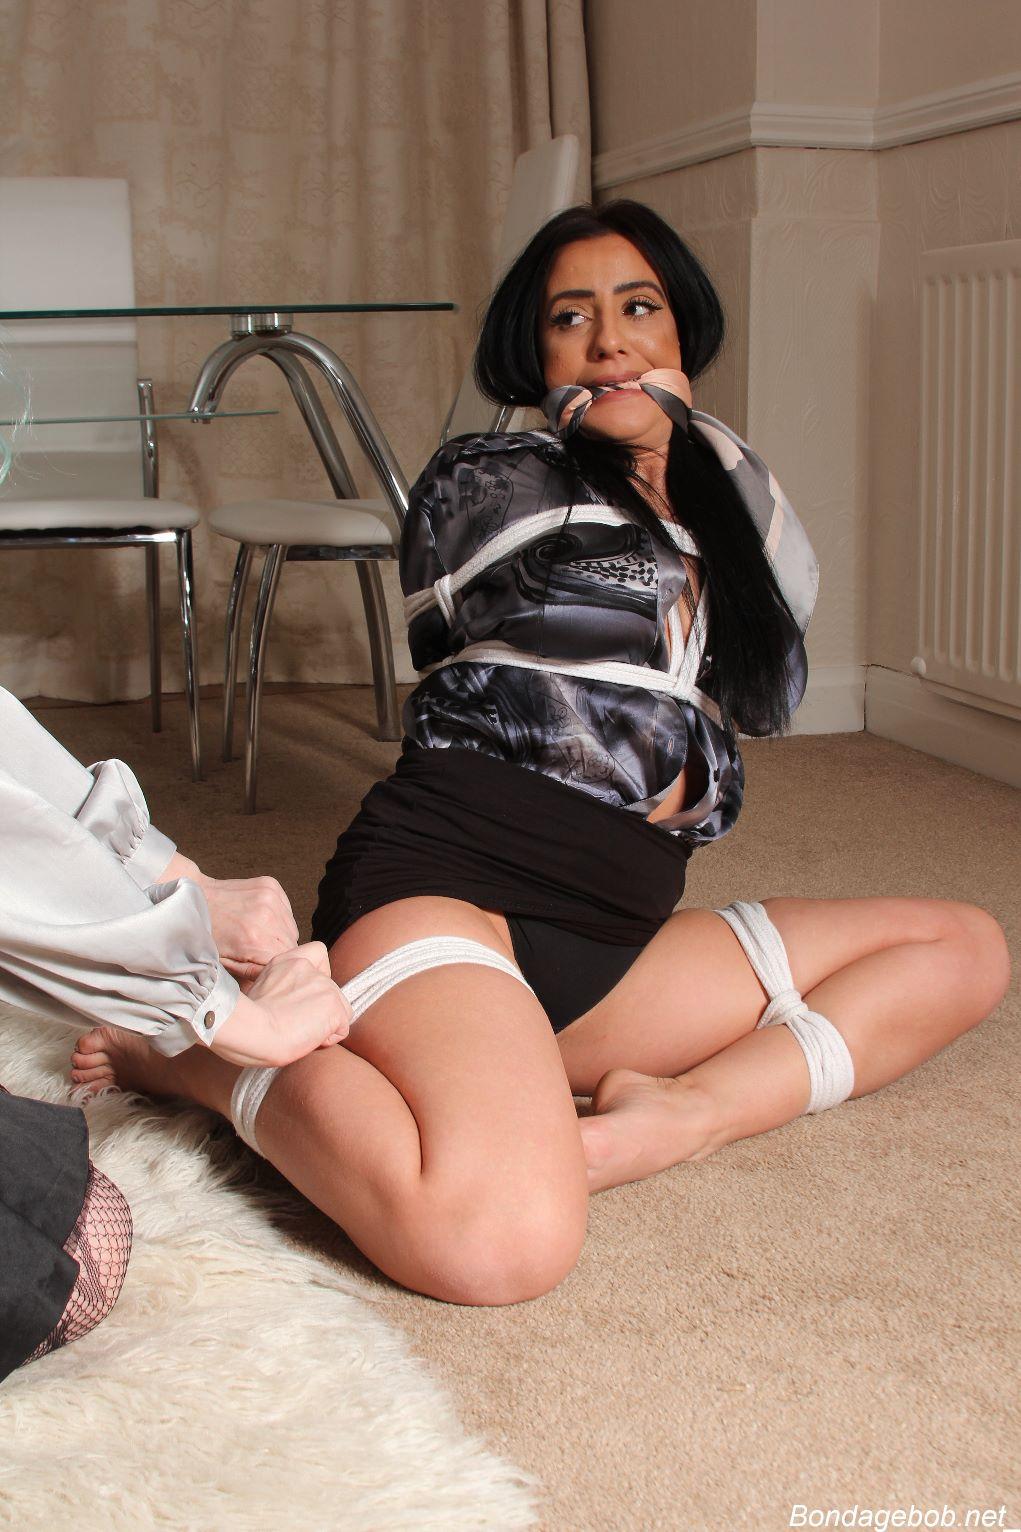 Tara May in bondage.